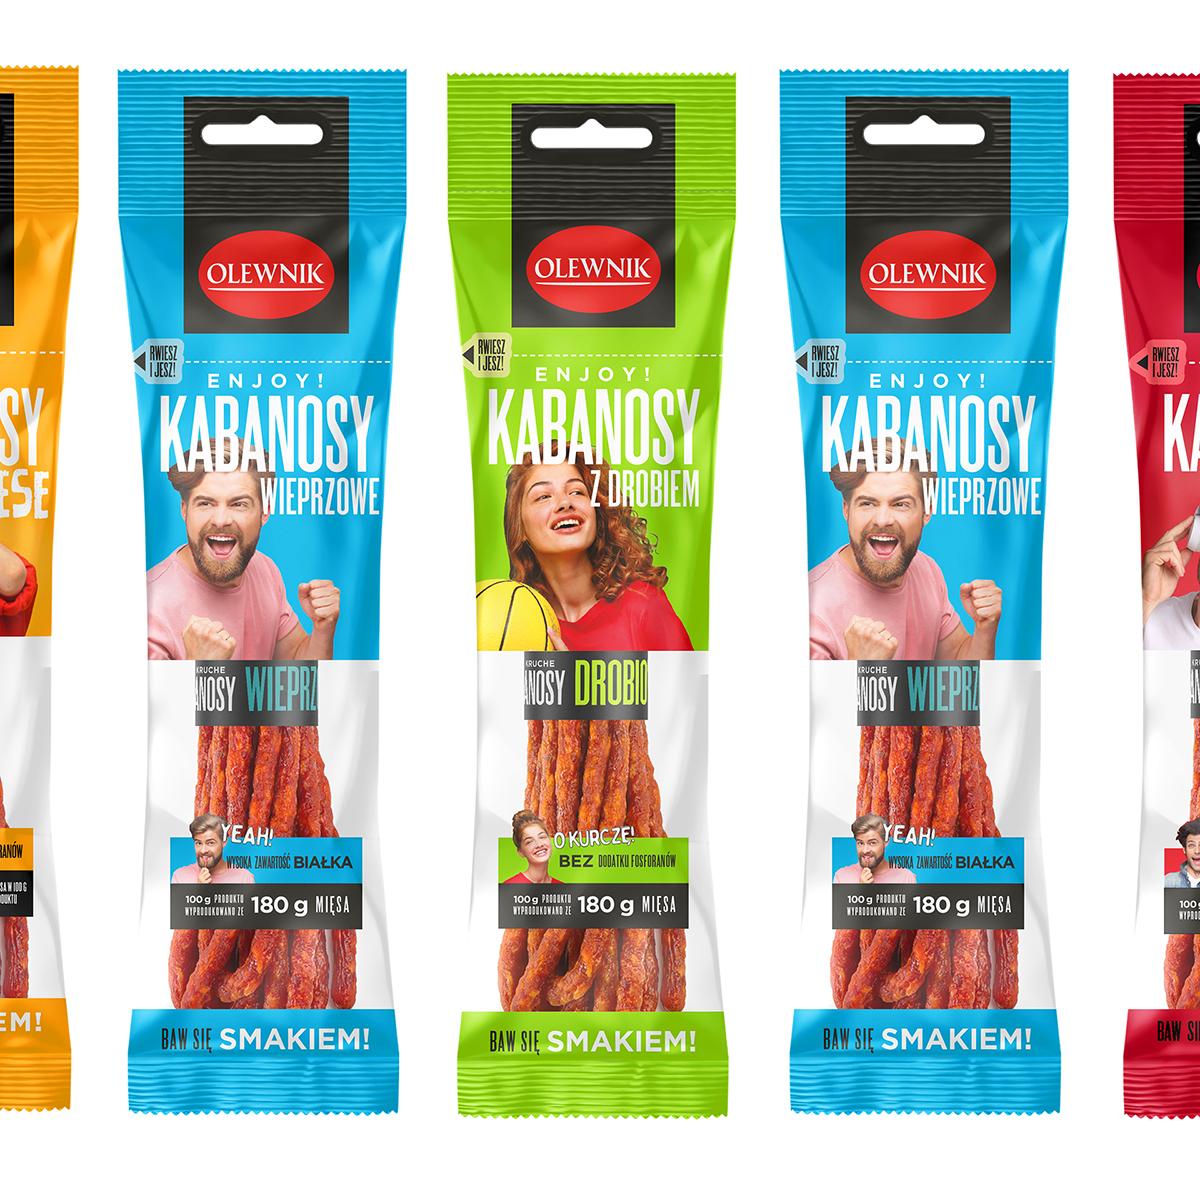 kabanosy olewnik - agencja reklamowa opakowania